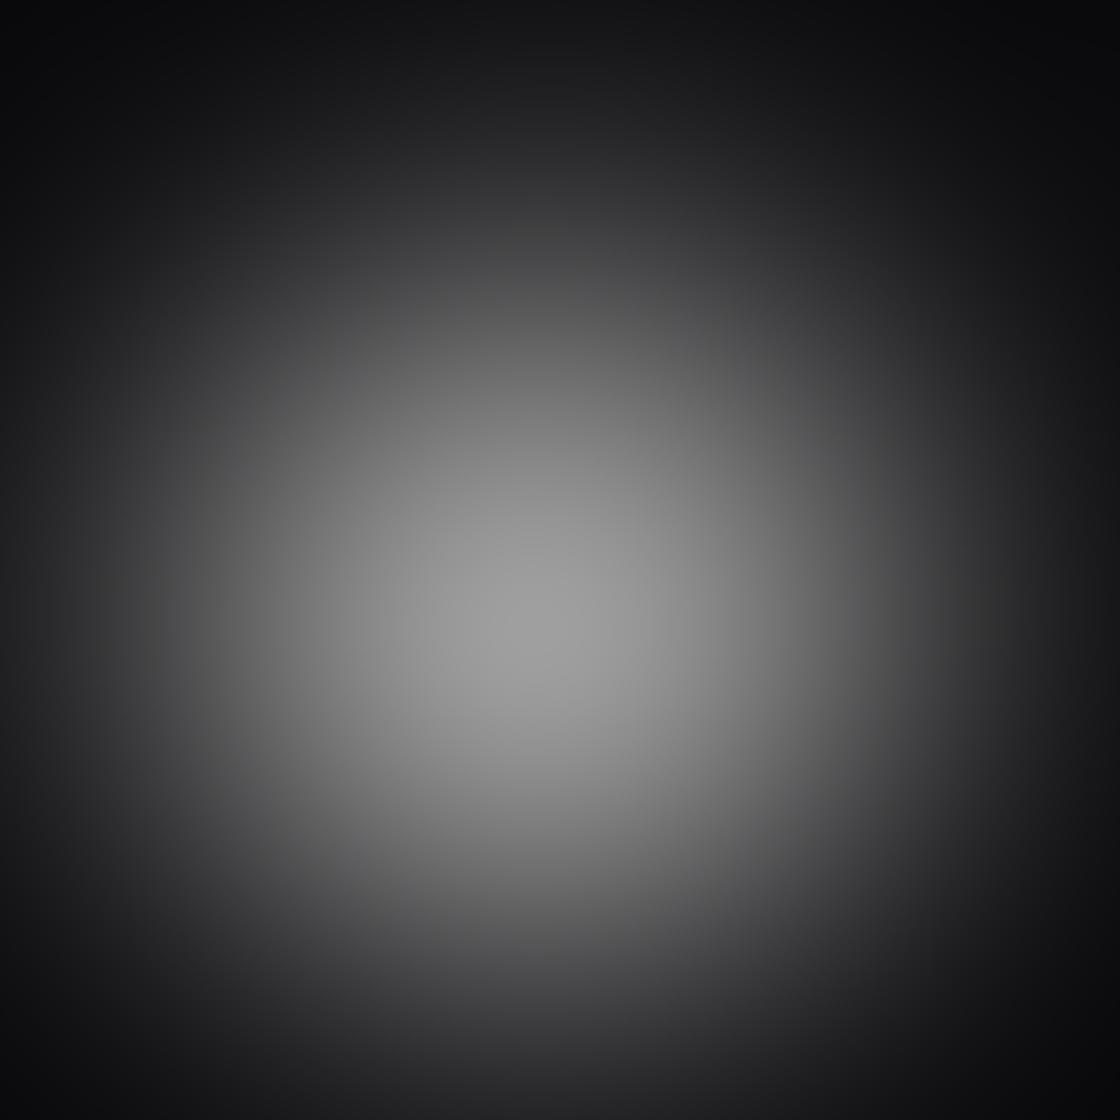 iPhone Angle Photo 03